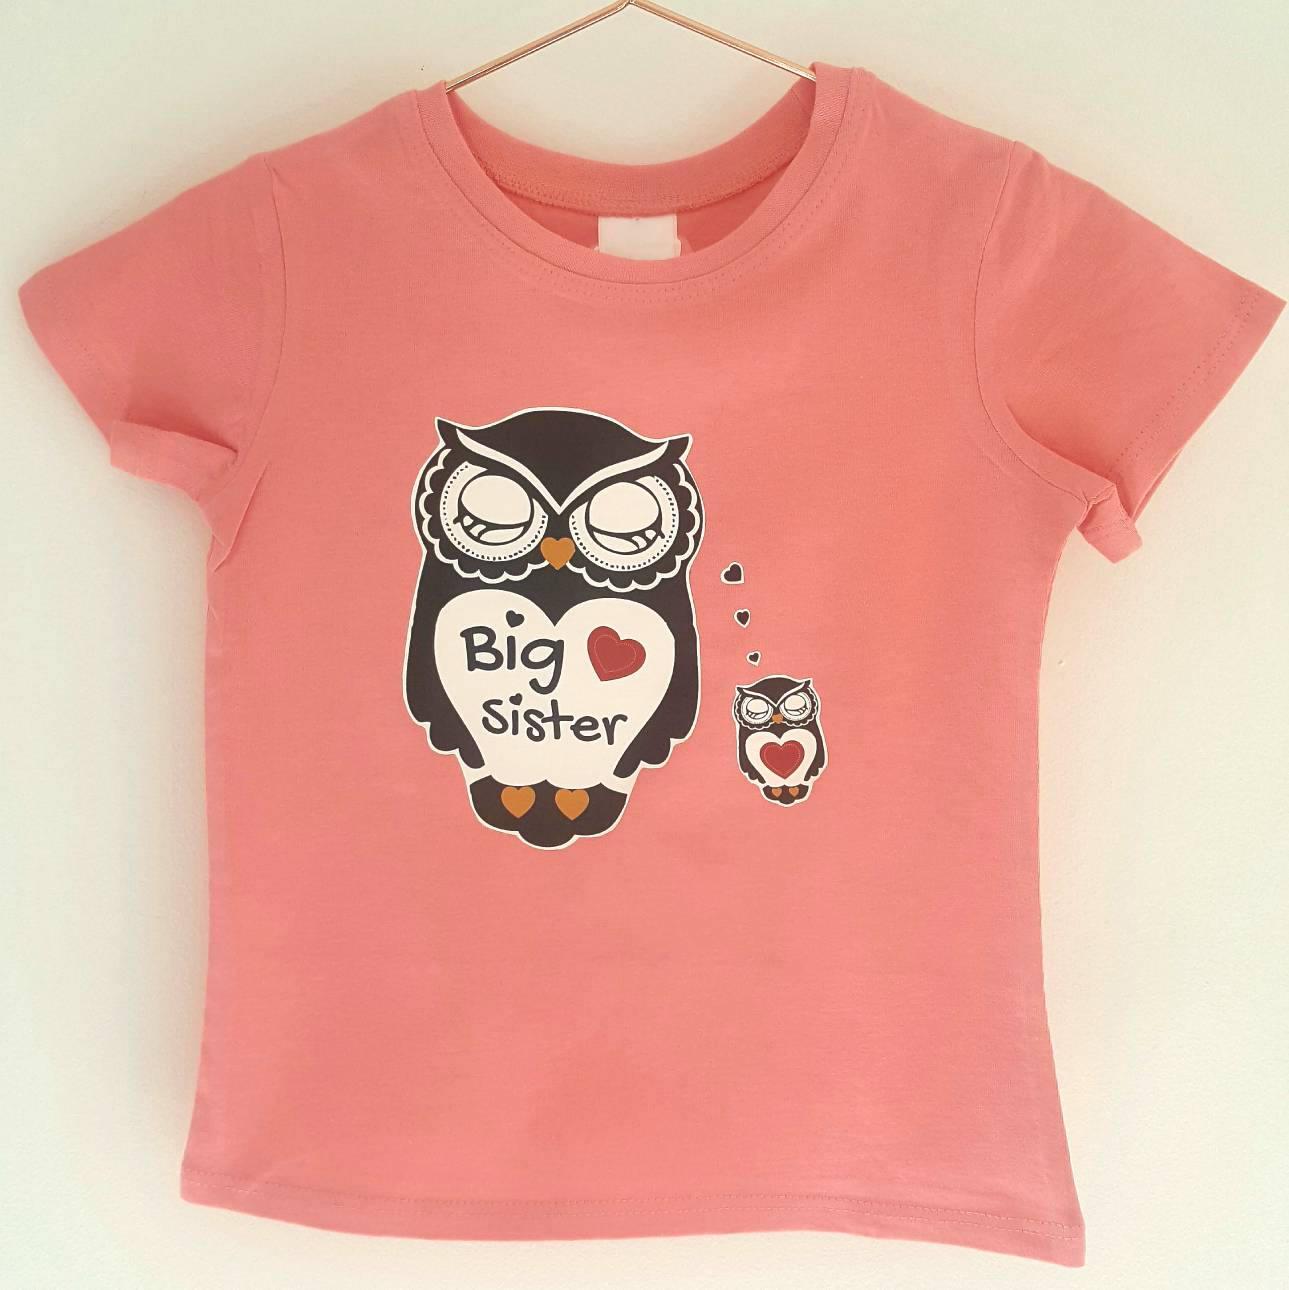 4a8acae3 Sister T Shirt. sisters heart t shirt sister t shirt teepublic. buy ...